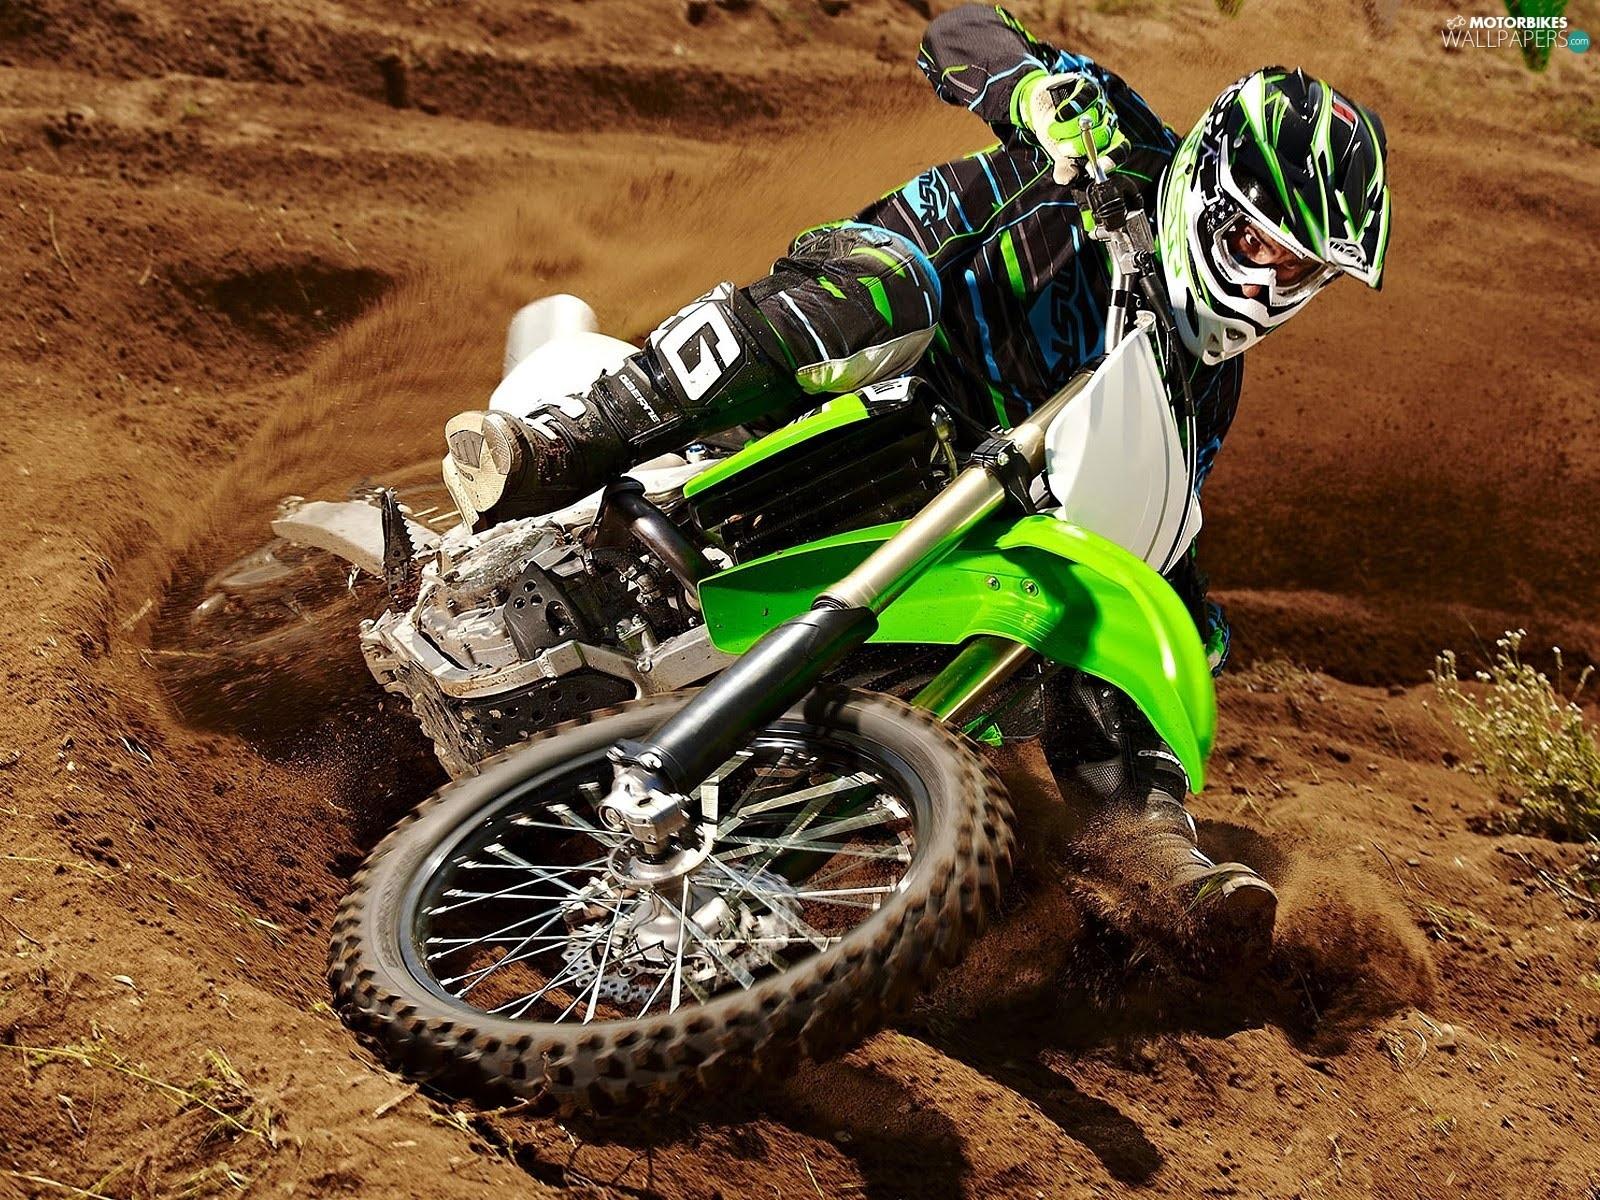 Motorcycle Racing On The Sand Suzuki Hd Desktop Mobile: Motorbikes Wallpapers: 1600x1200